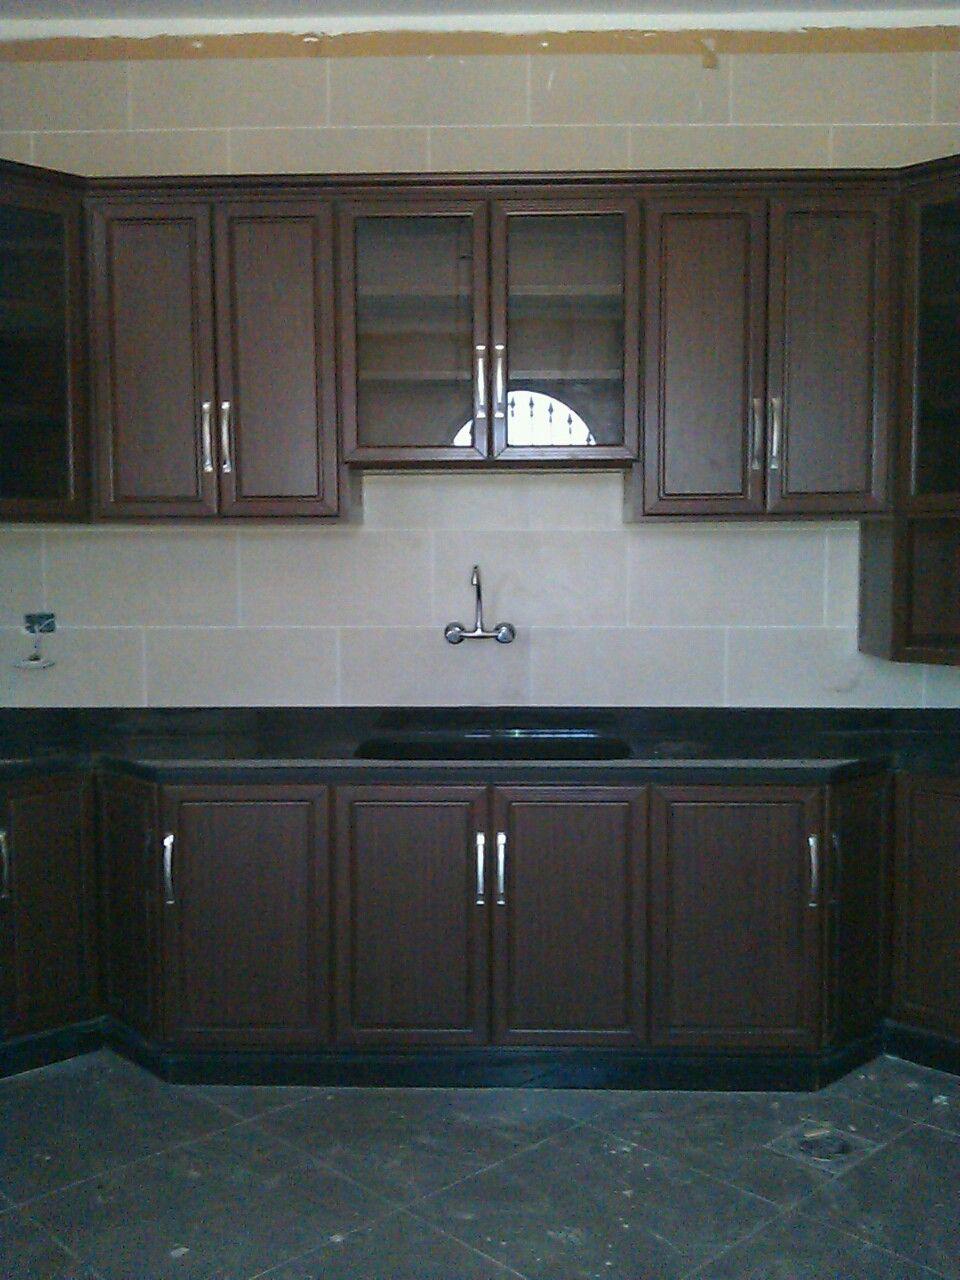 Pin By Sasa Yasa On مطابخ Home Decor Kitchen Kitchen Cabinets